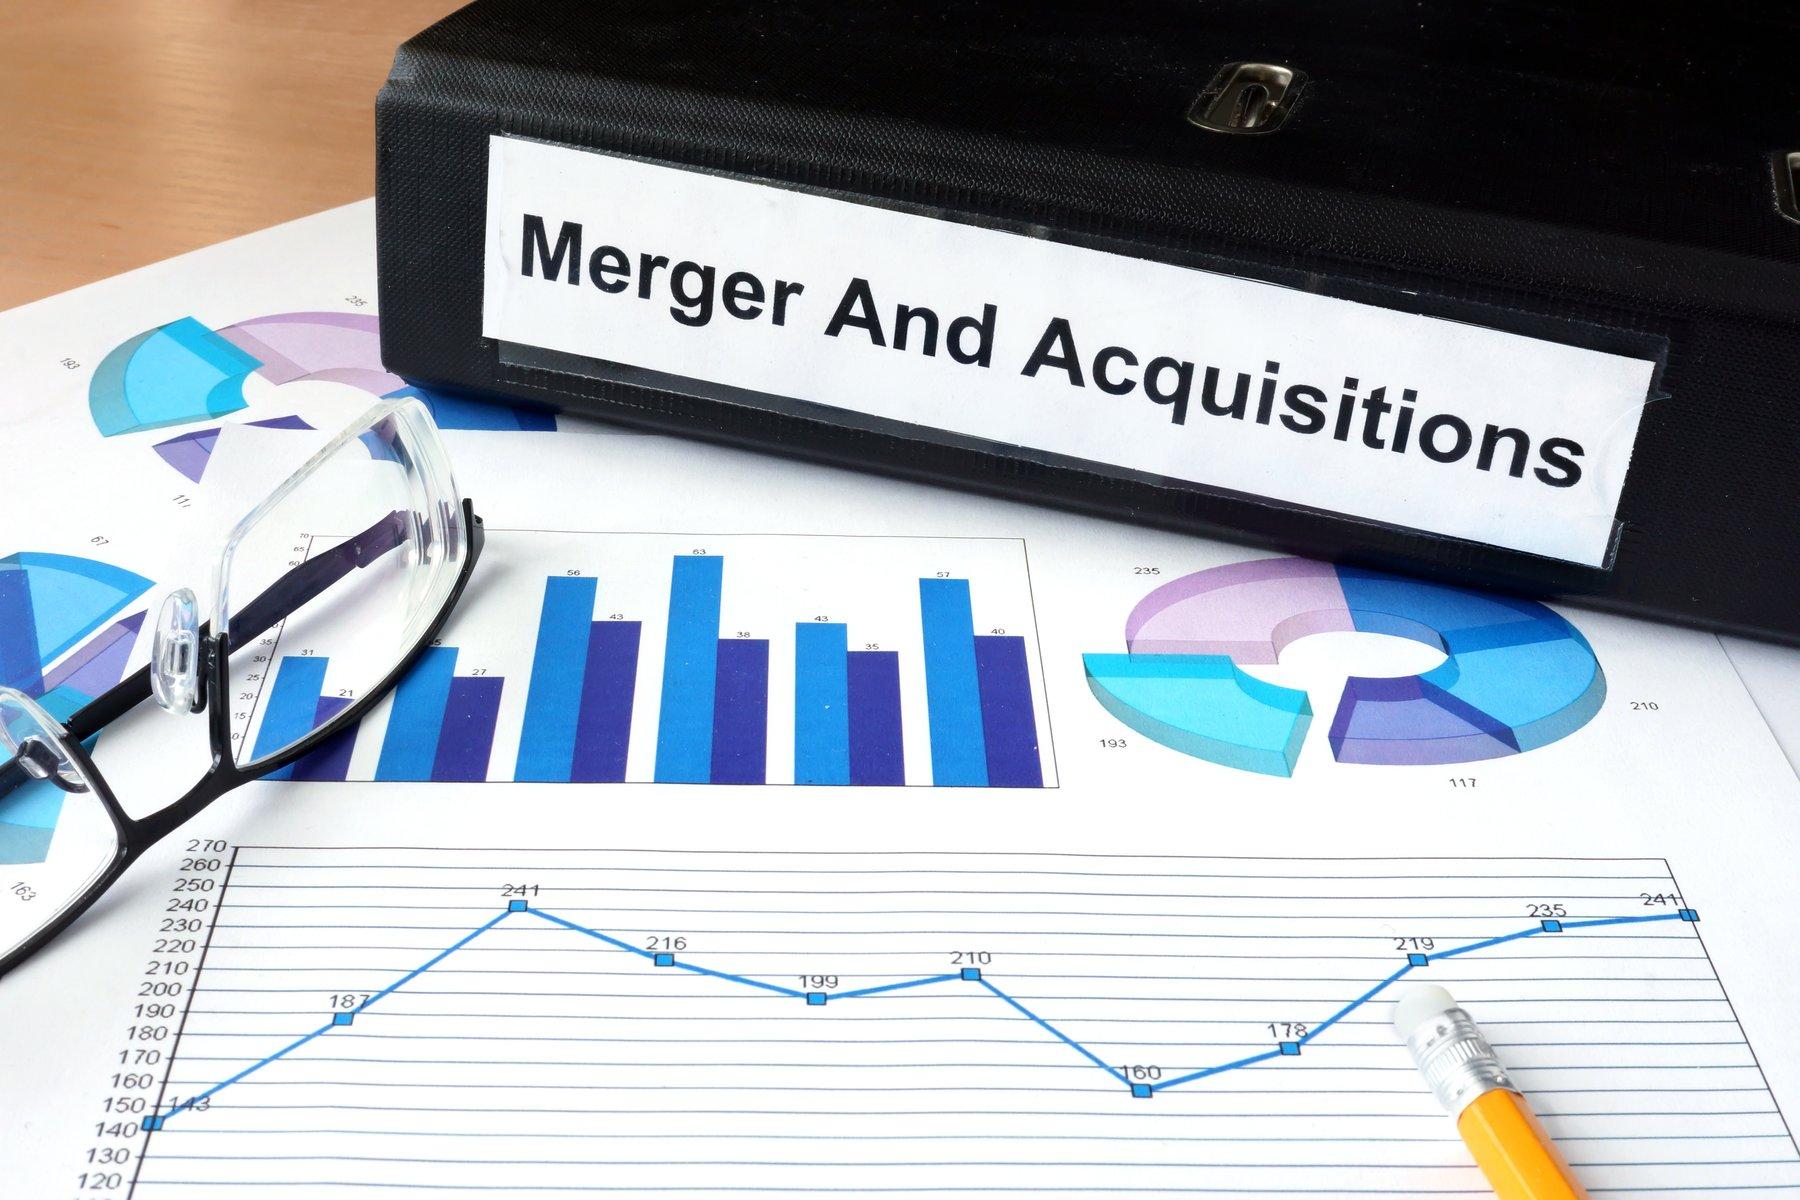 merger acqusition